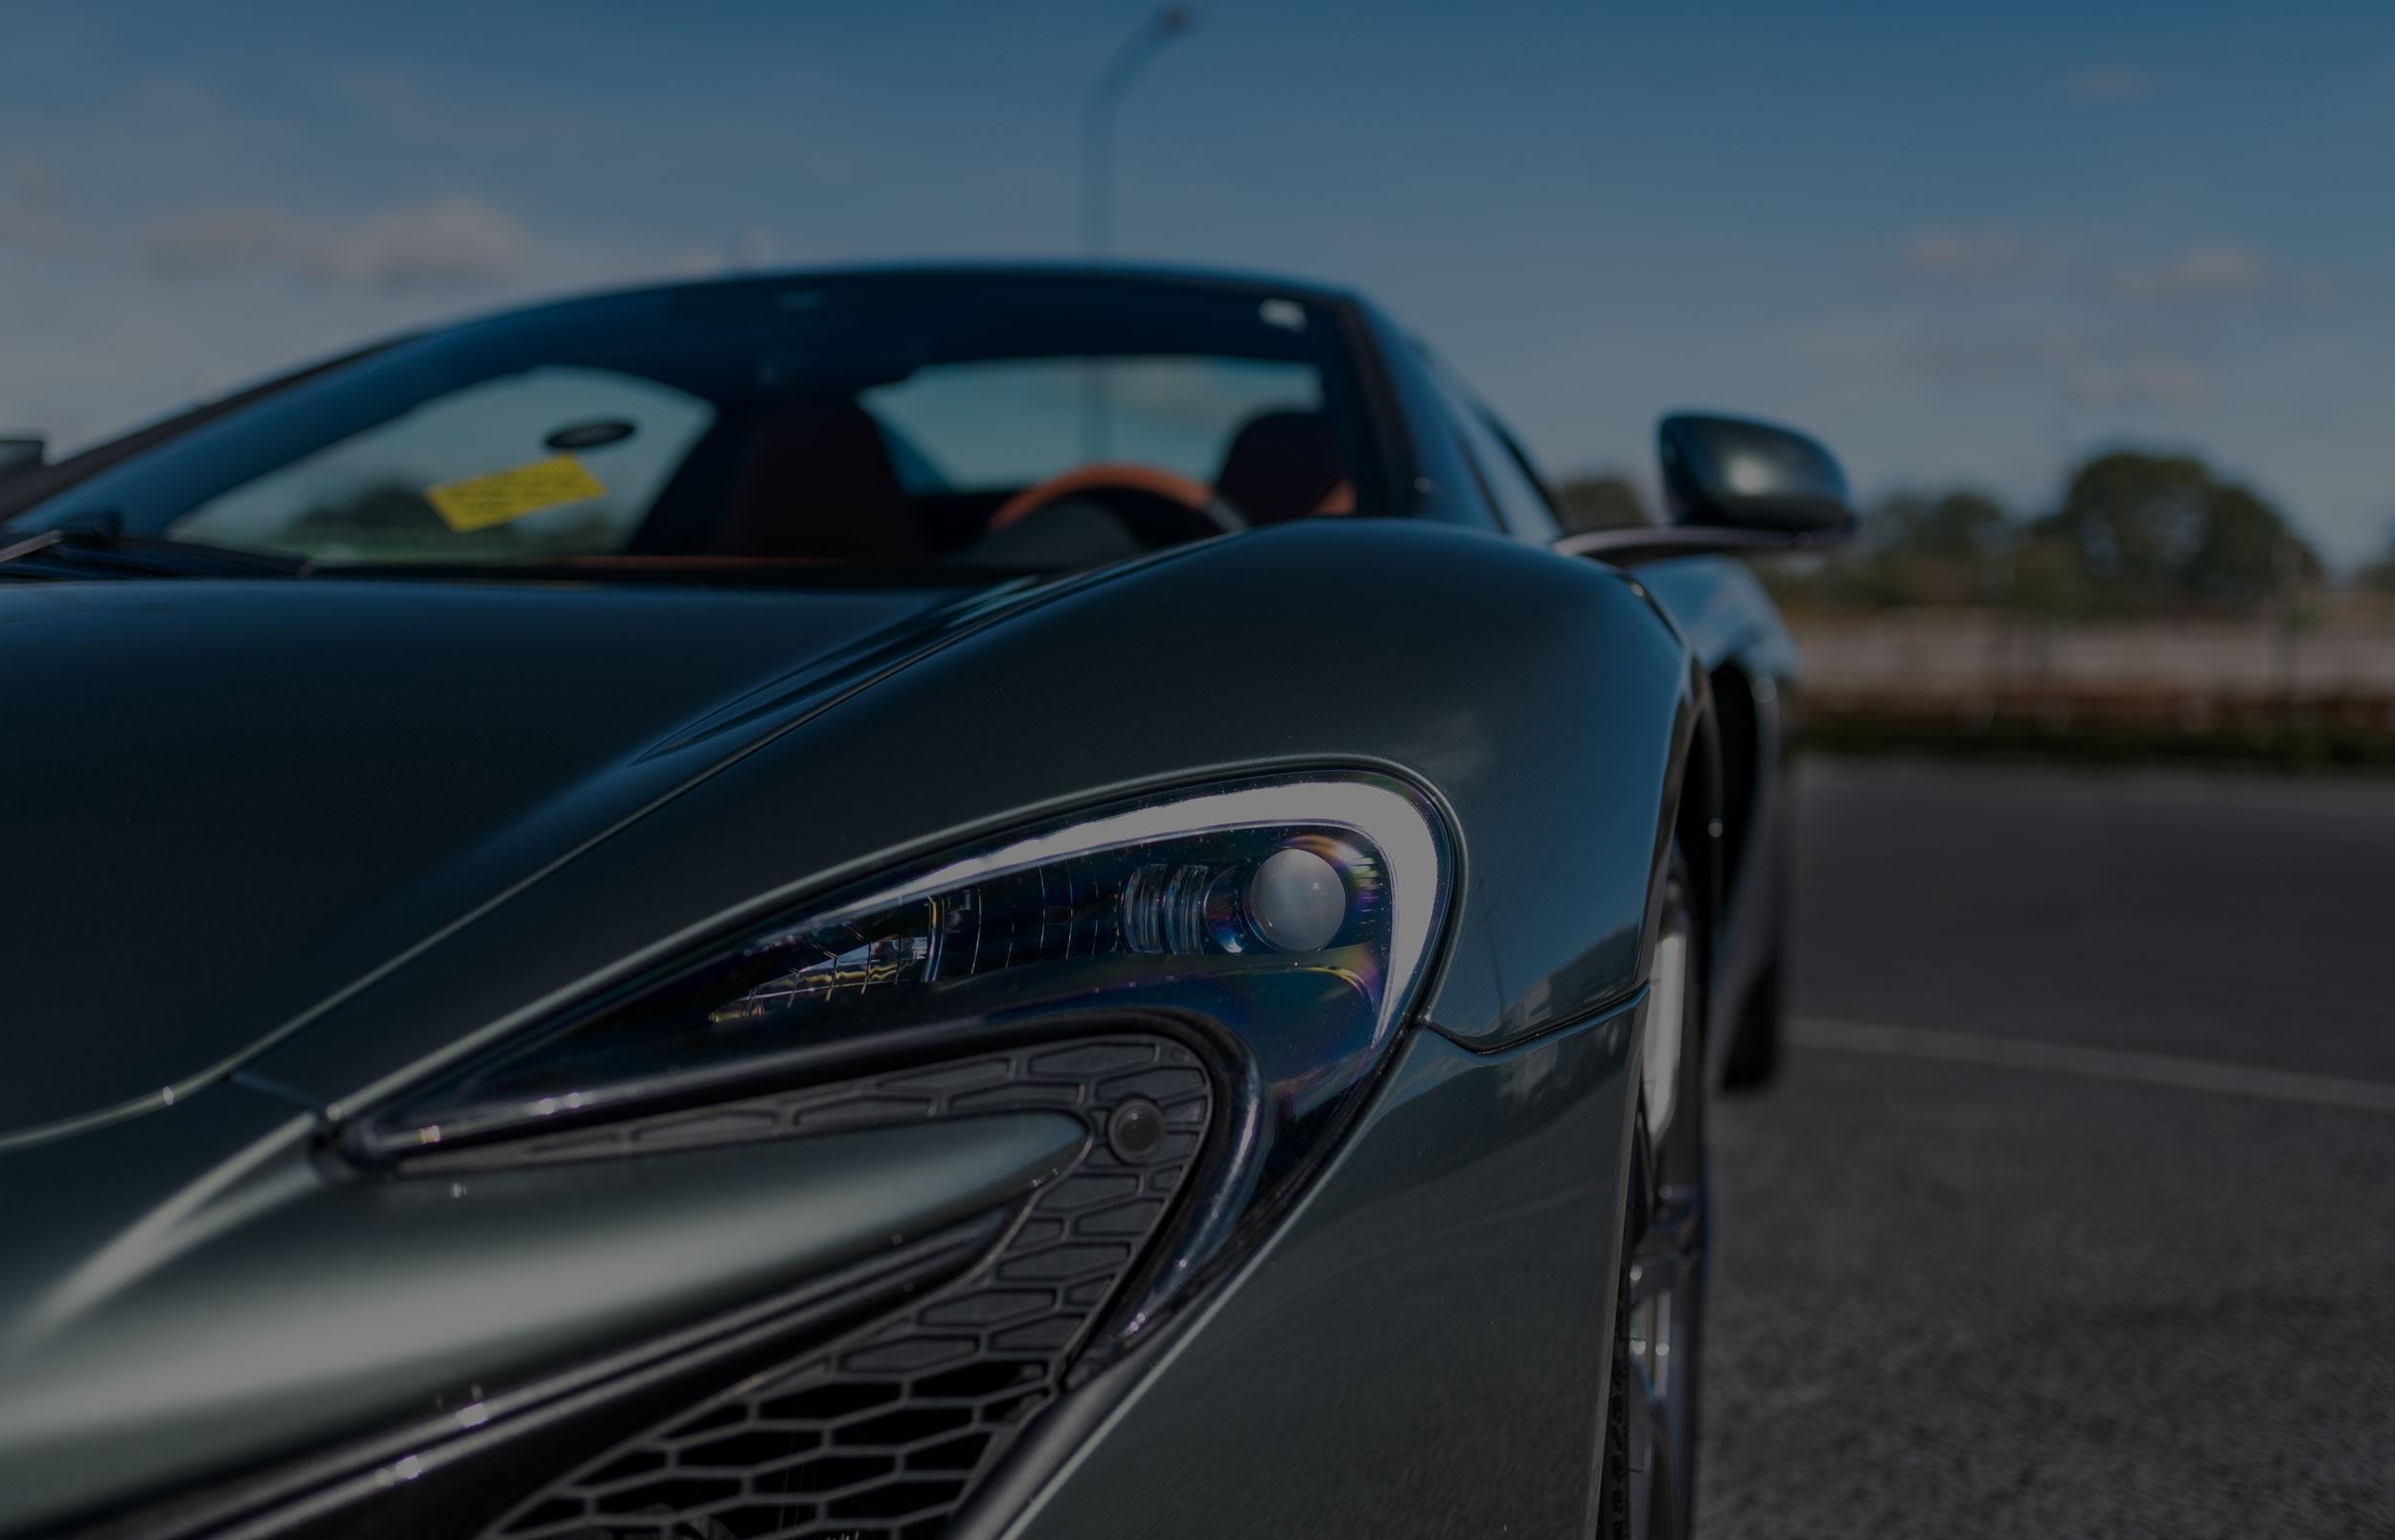 Opvallers Car Detailing | Portfolio